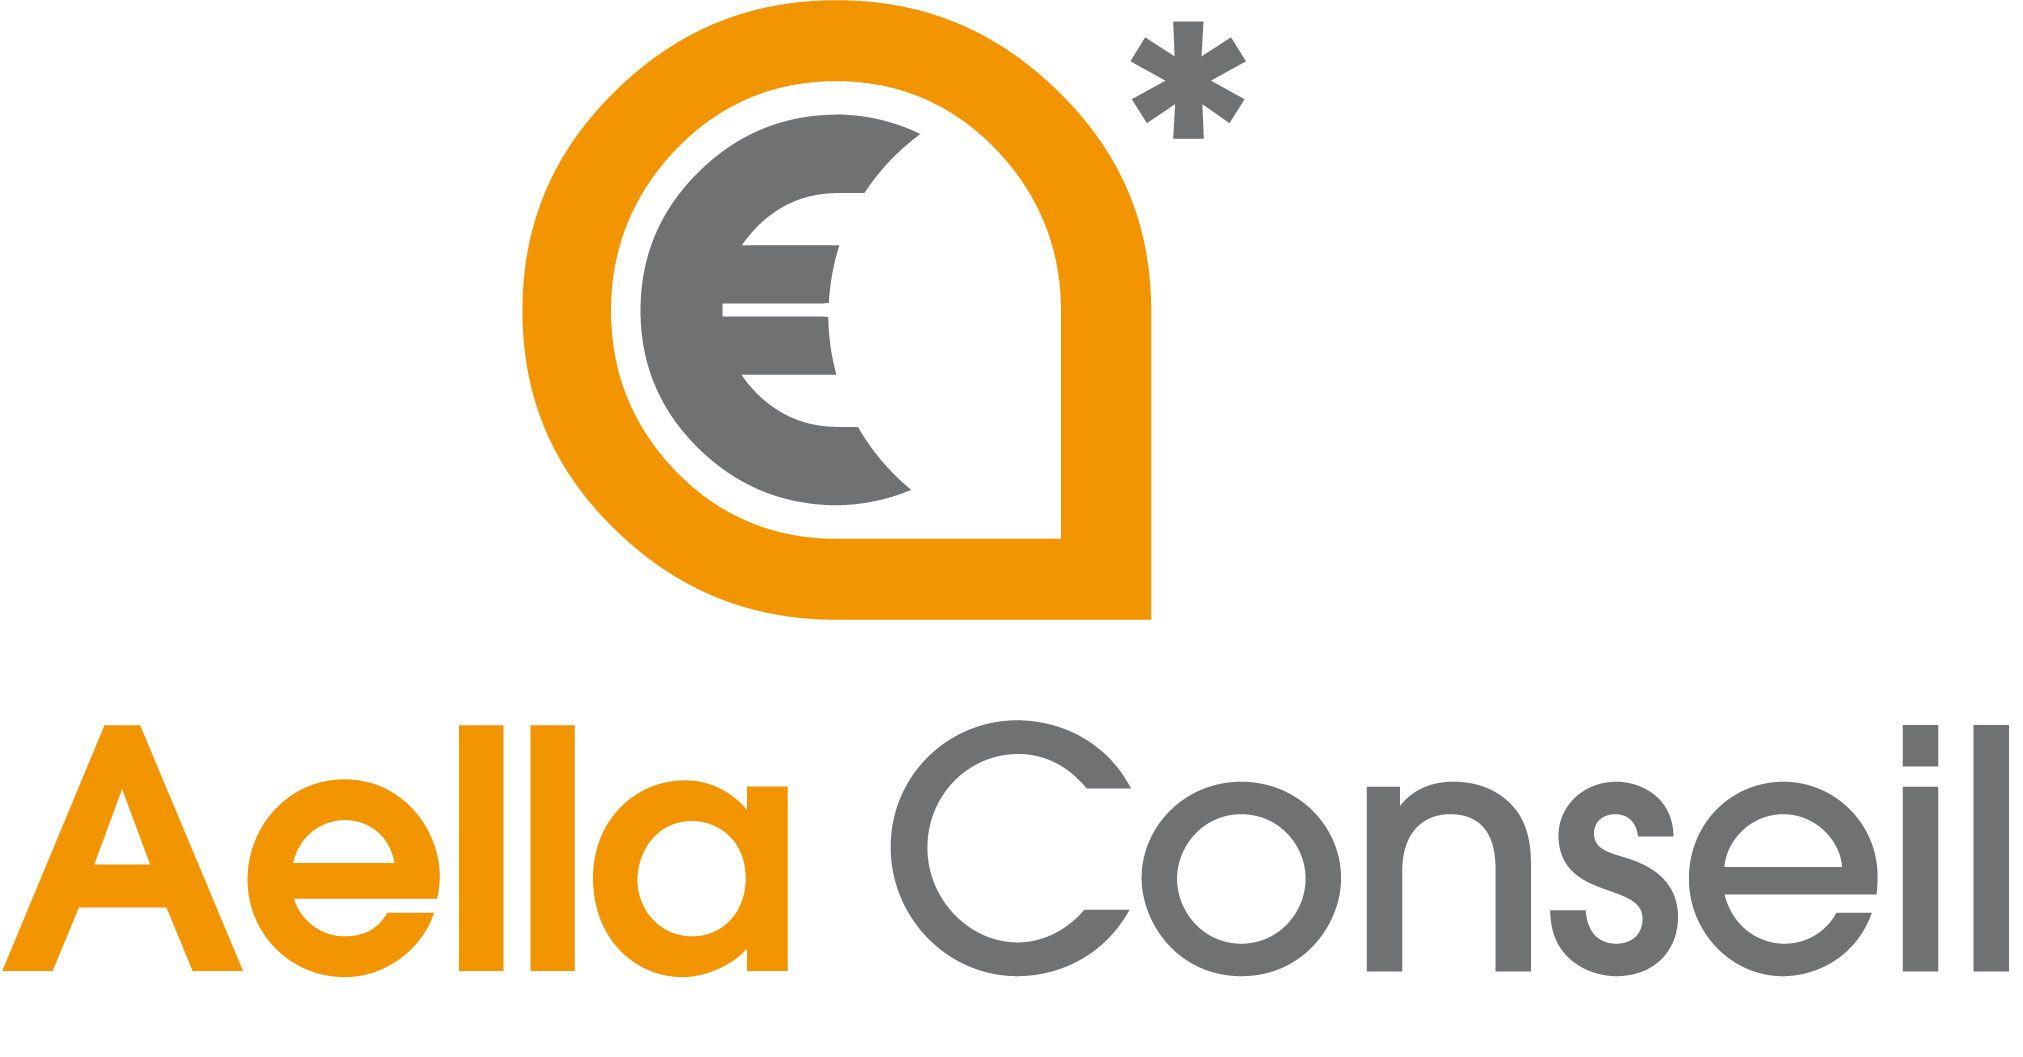 AELLA CONSEIL